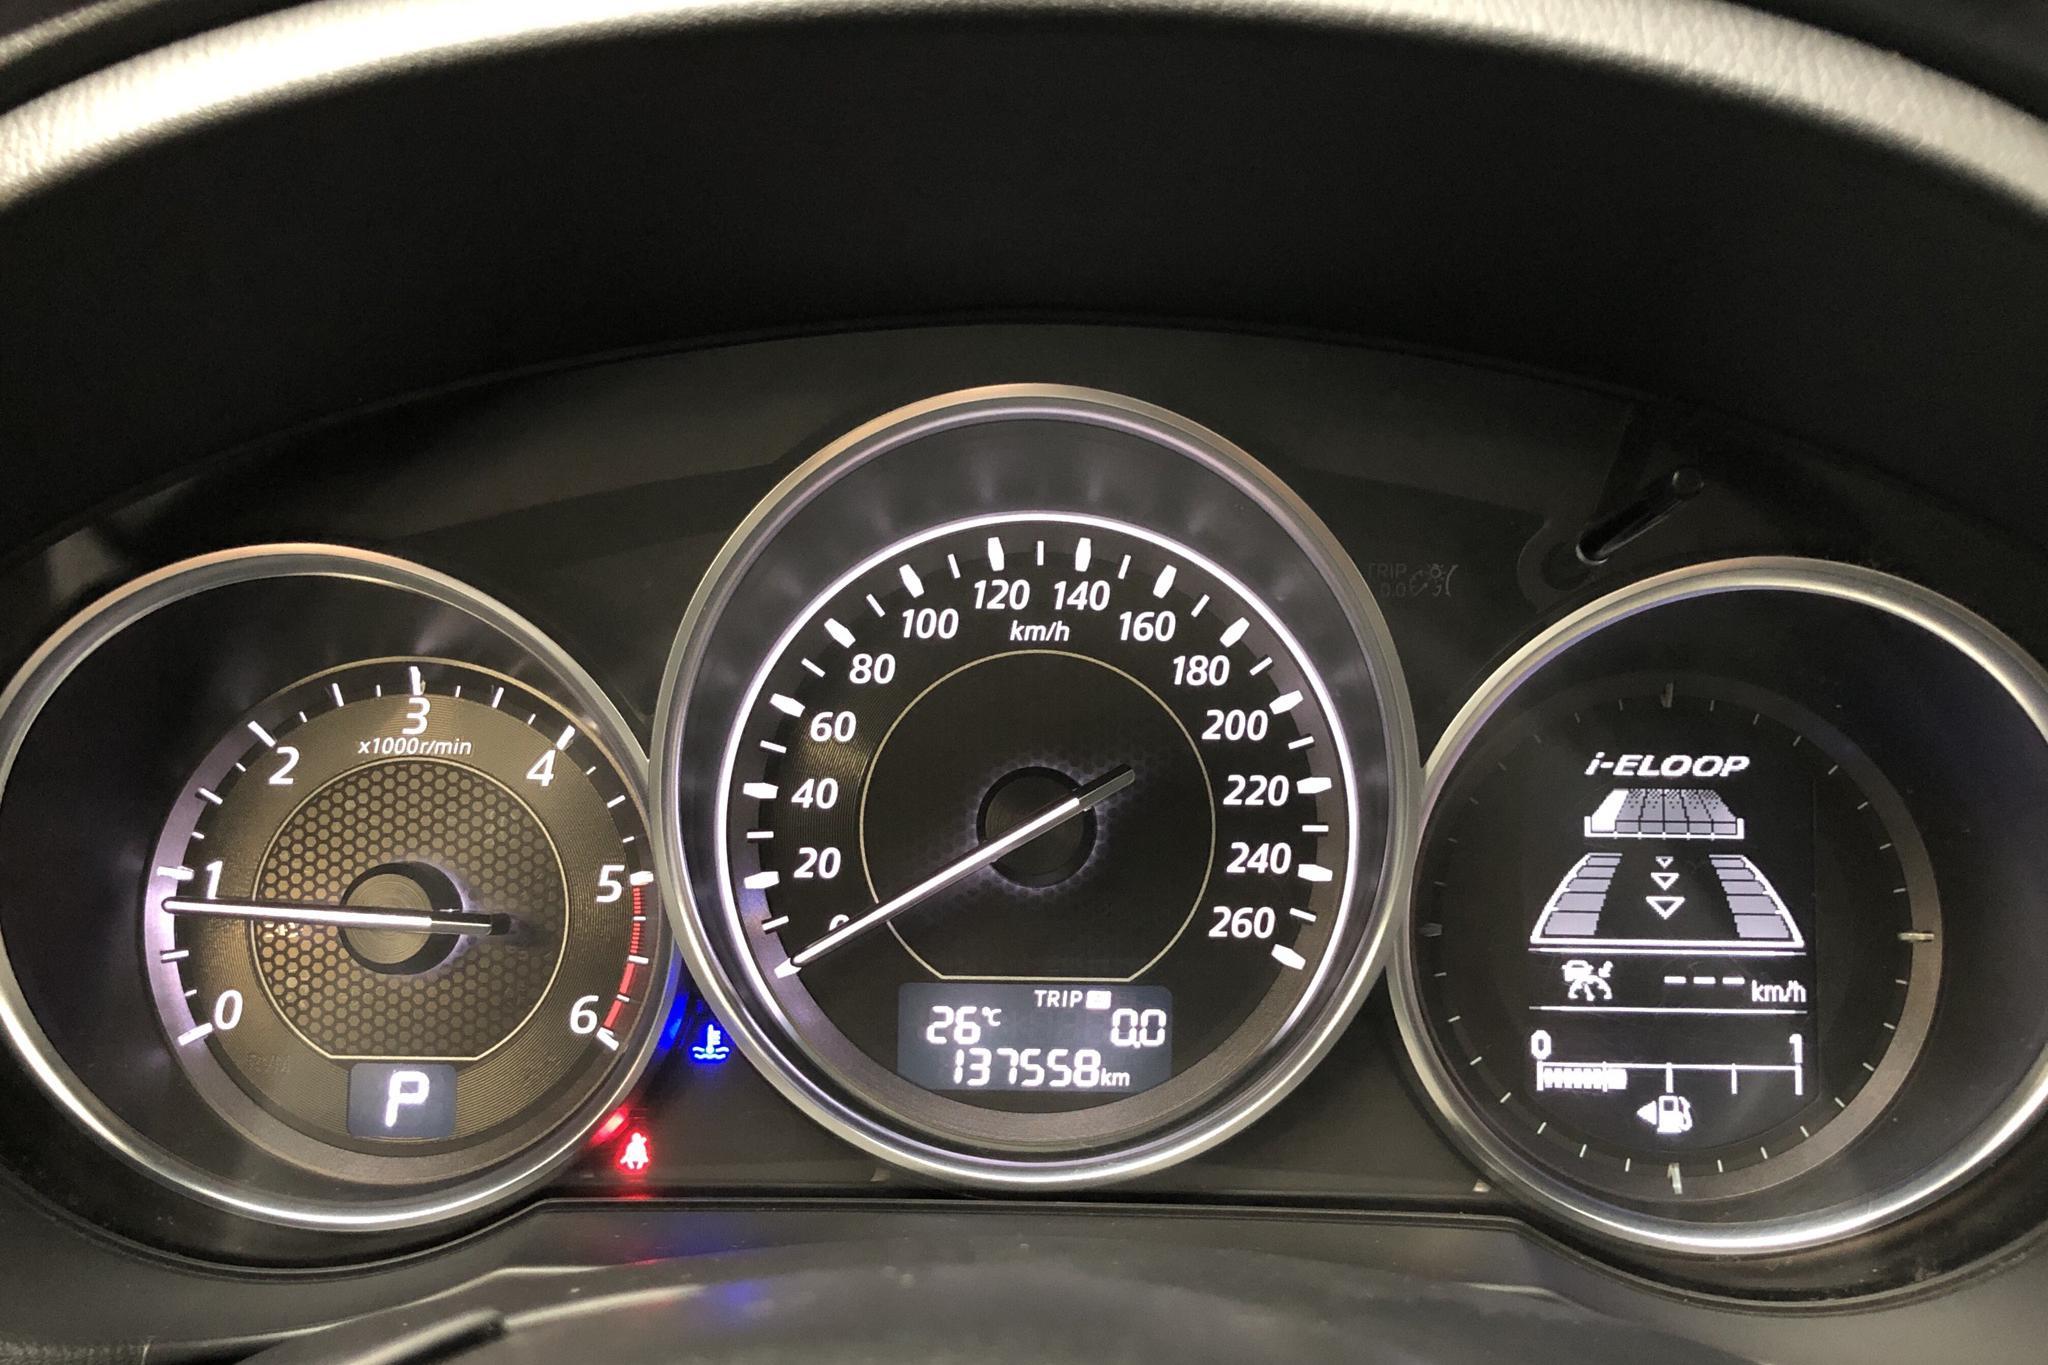 Mazda 6 2.2 DE Kombi (175hk) - 137 560 km - Automatic - gray - 2014